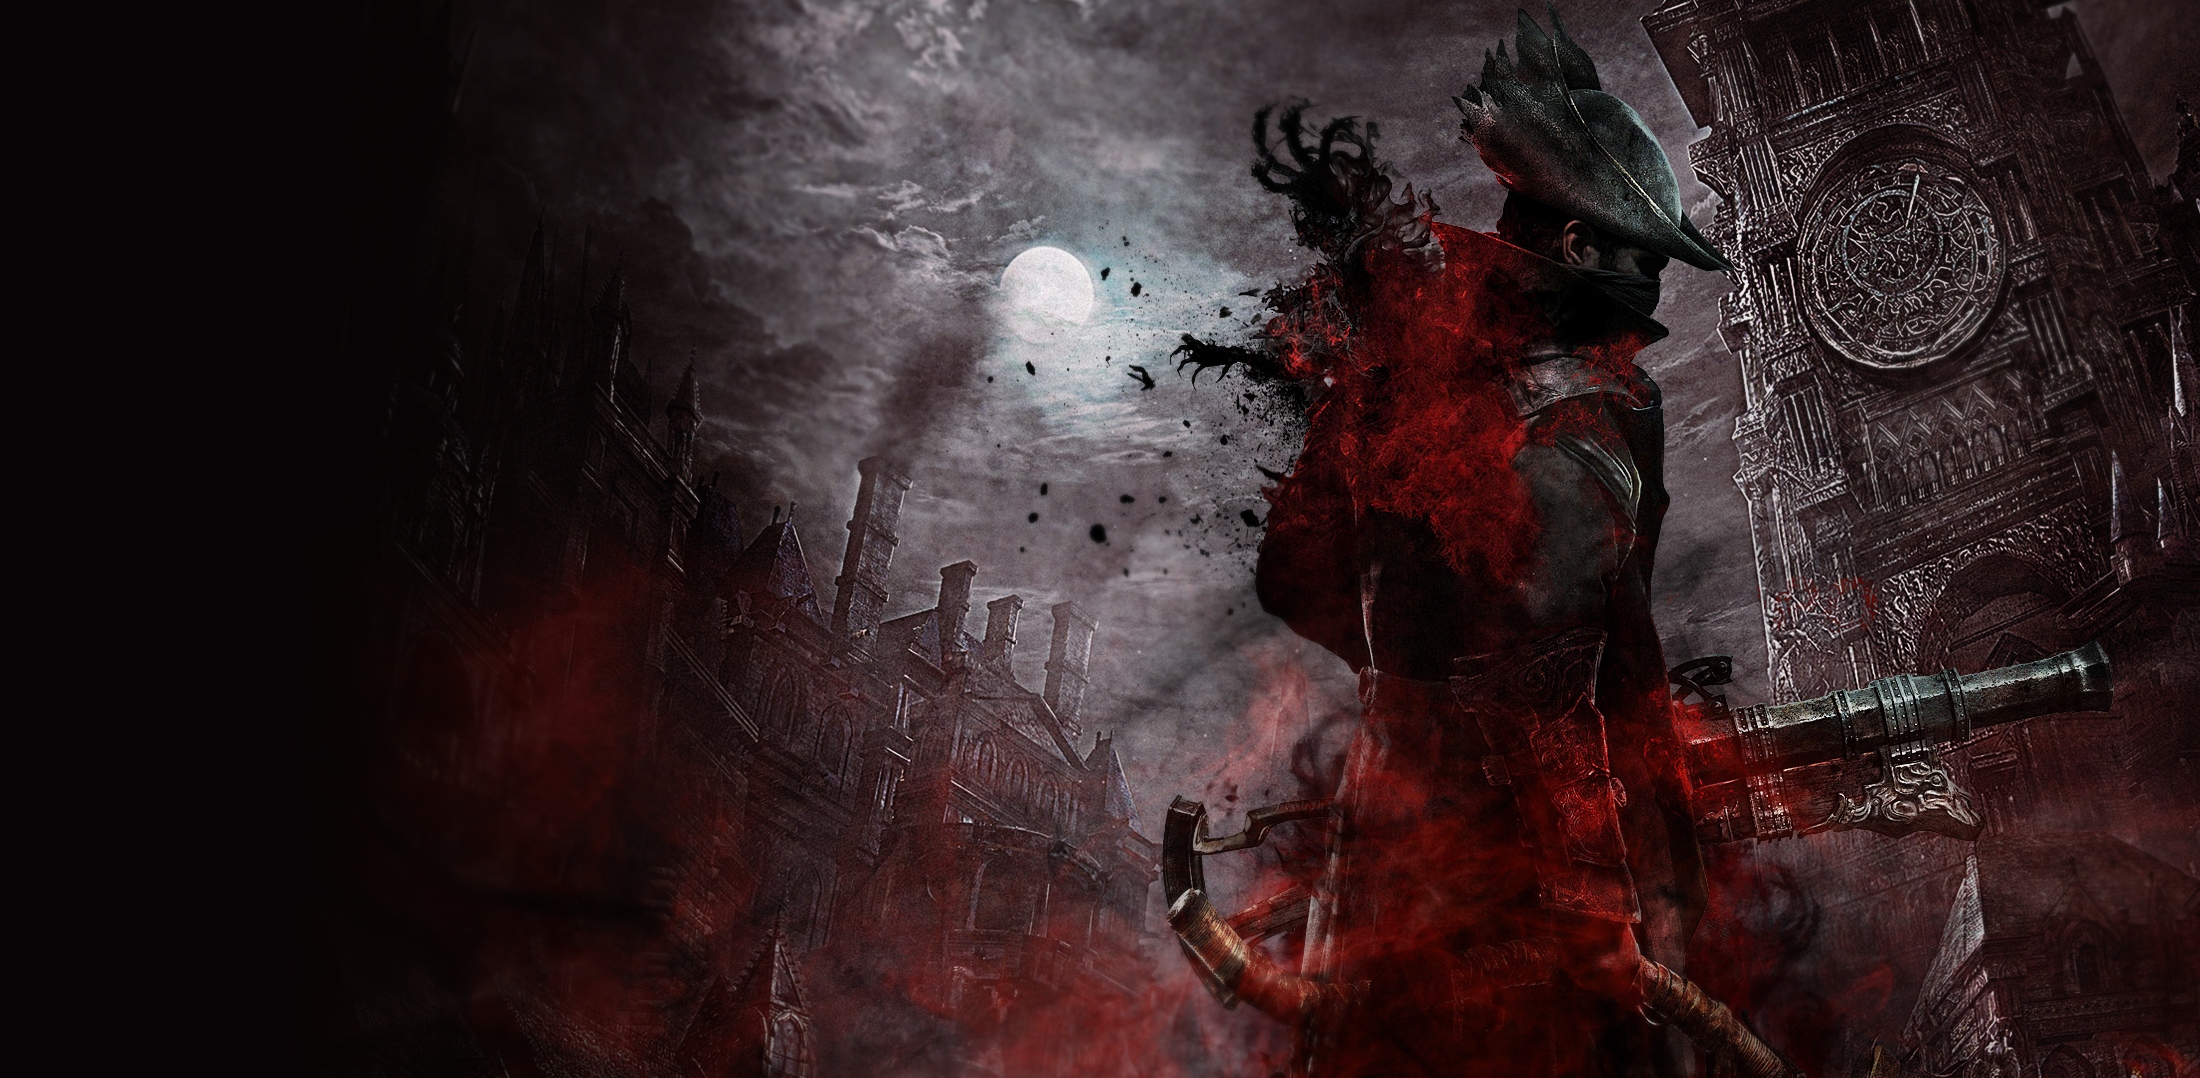 ANALIS DIS BLOODBORNE (CON SPOILERS)